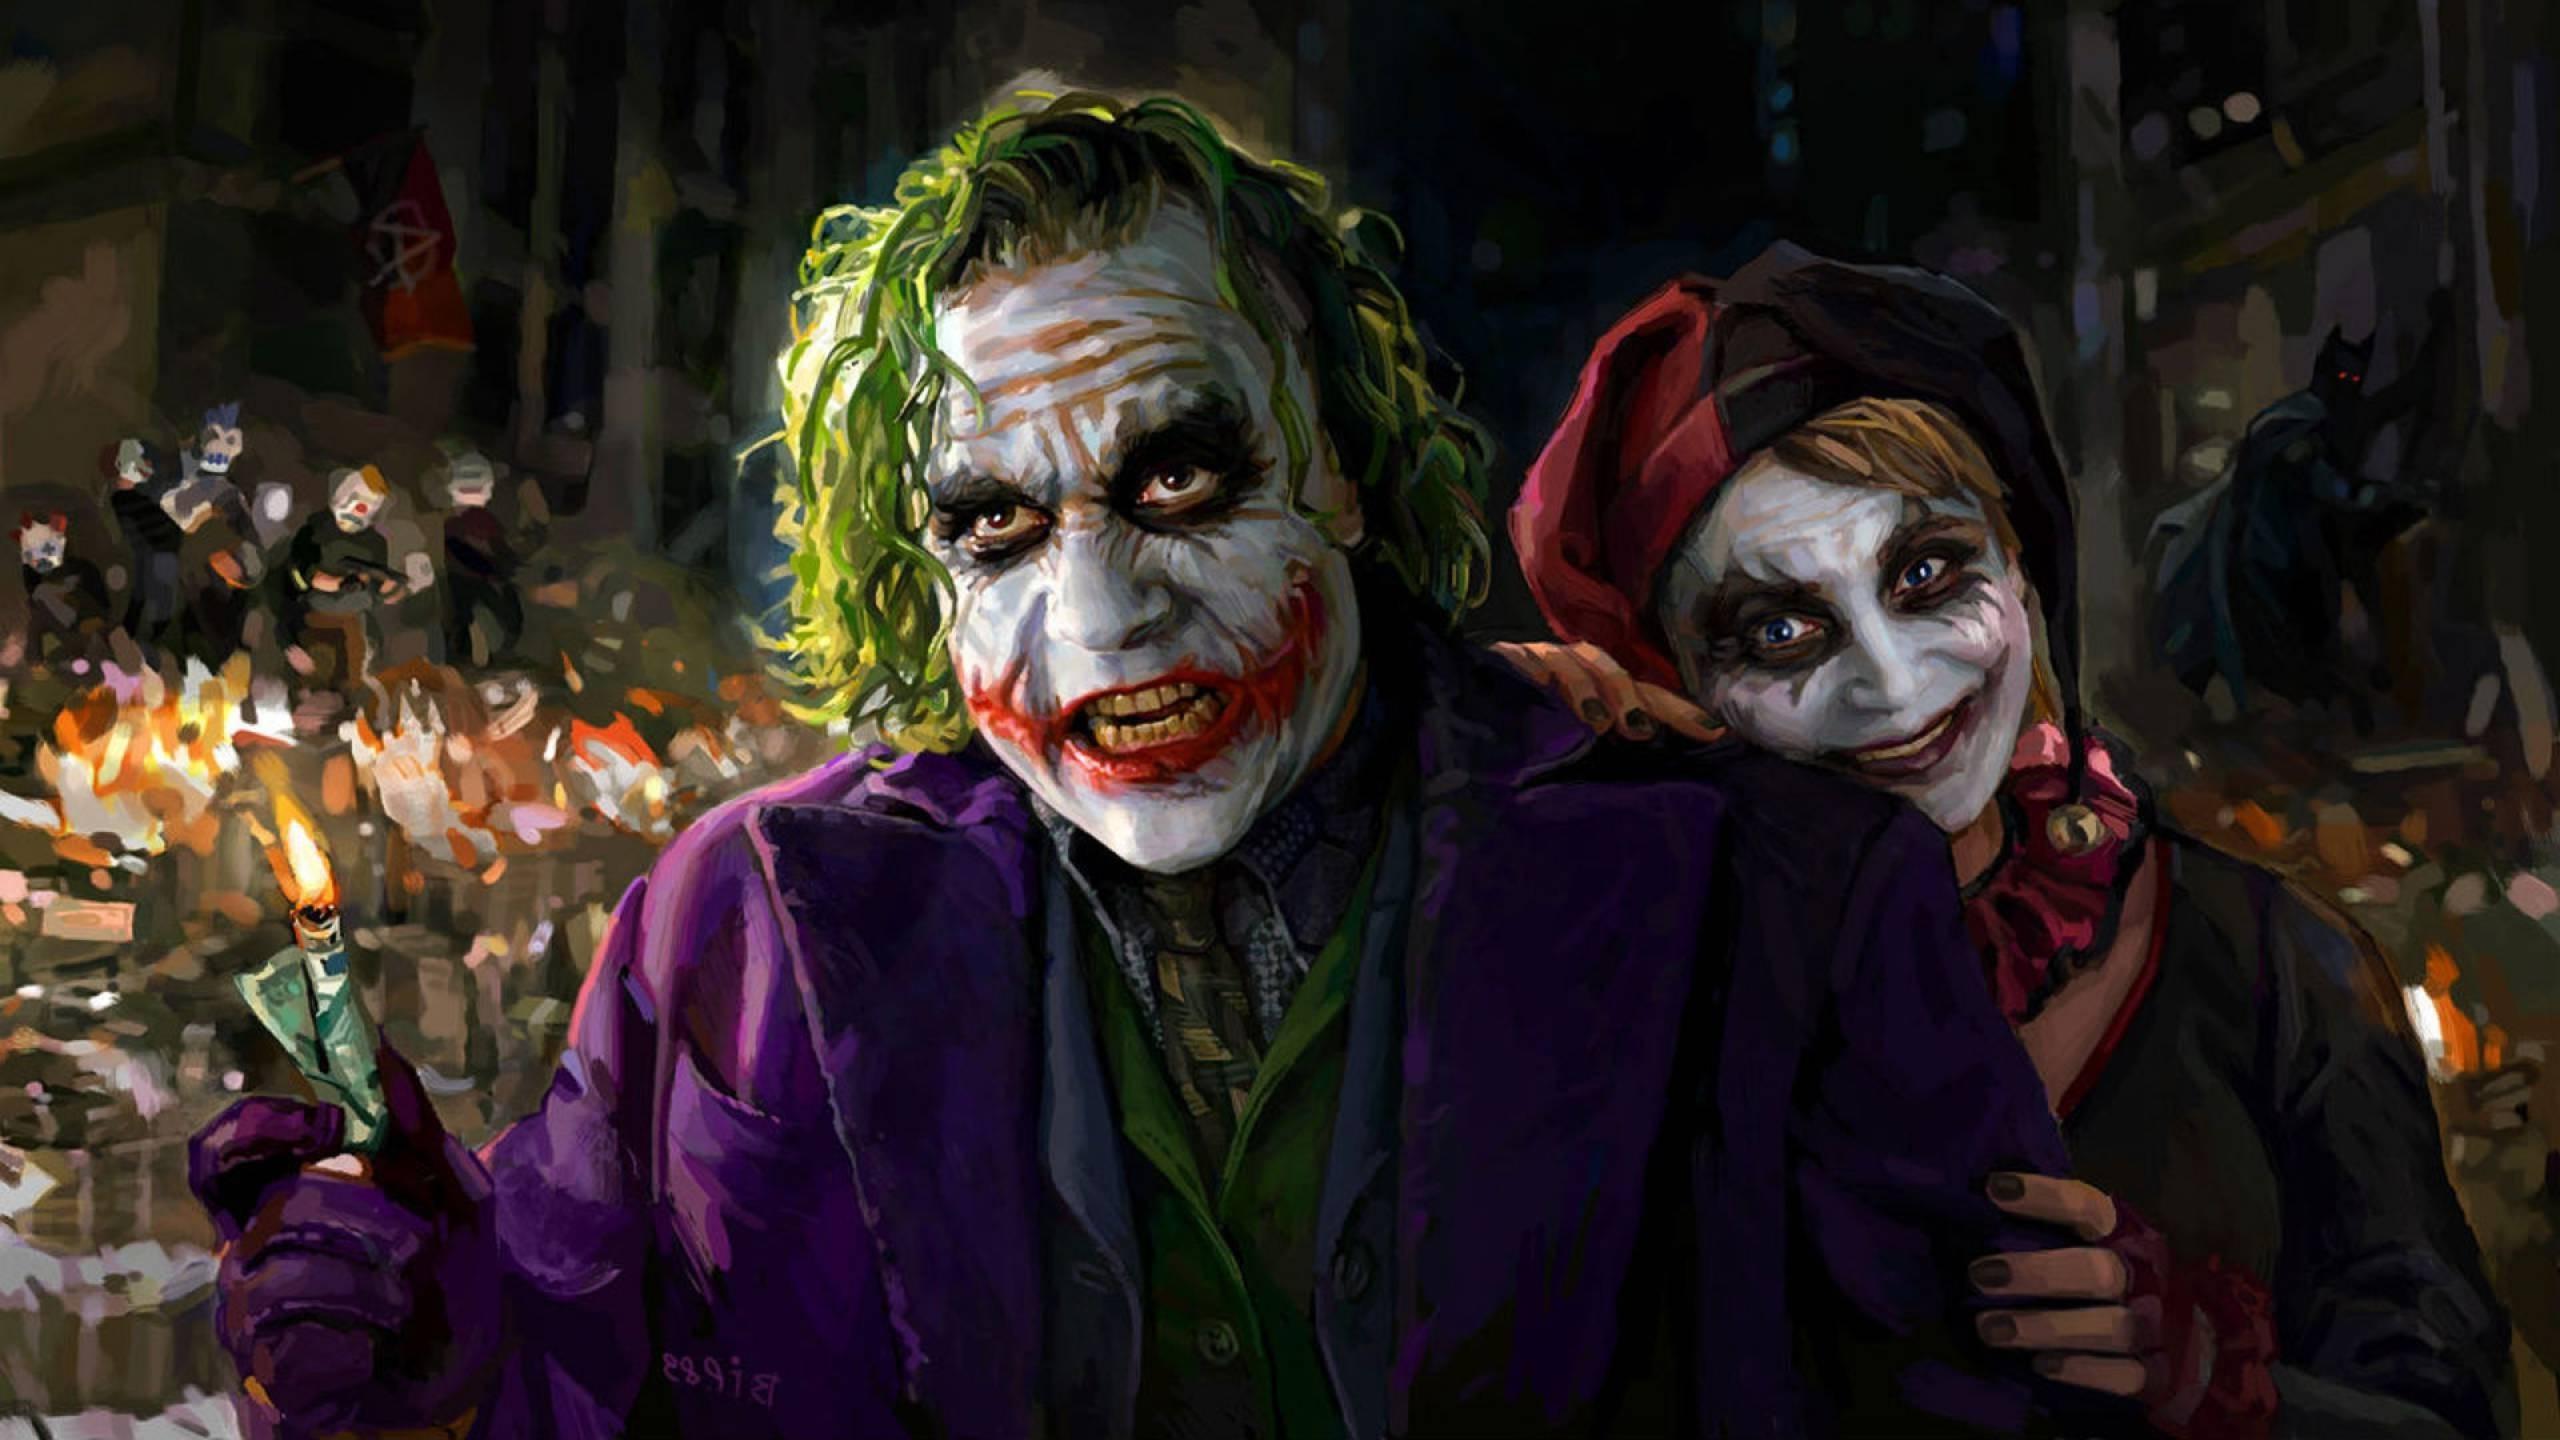 Joker harley quinn wallpaper